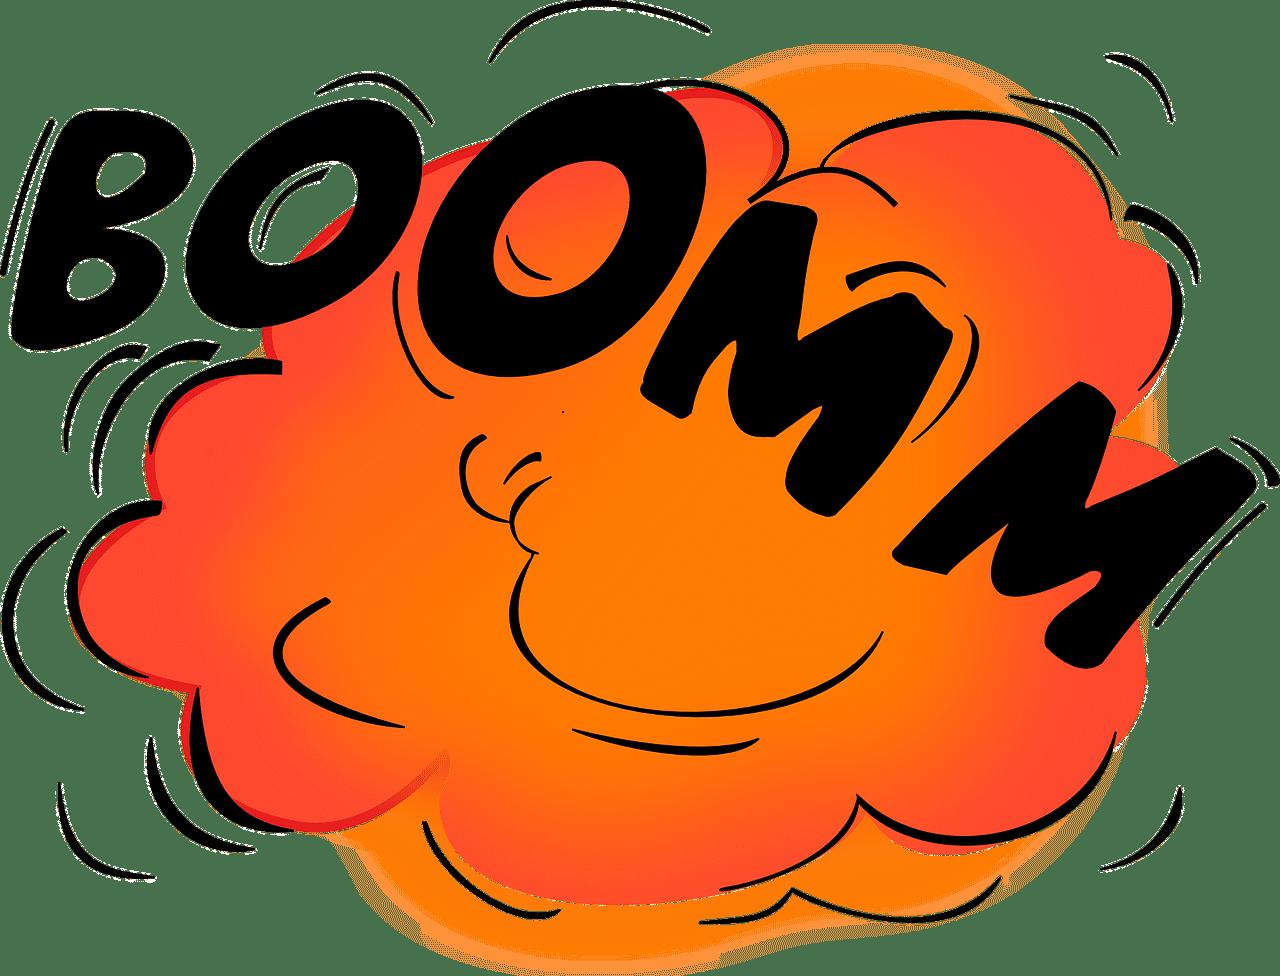 Explosion primes maladie